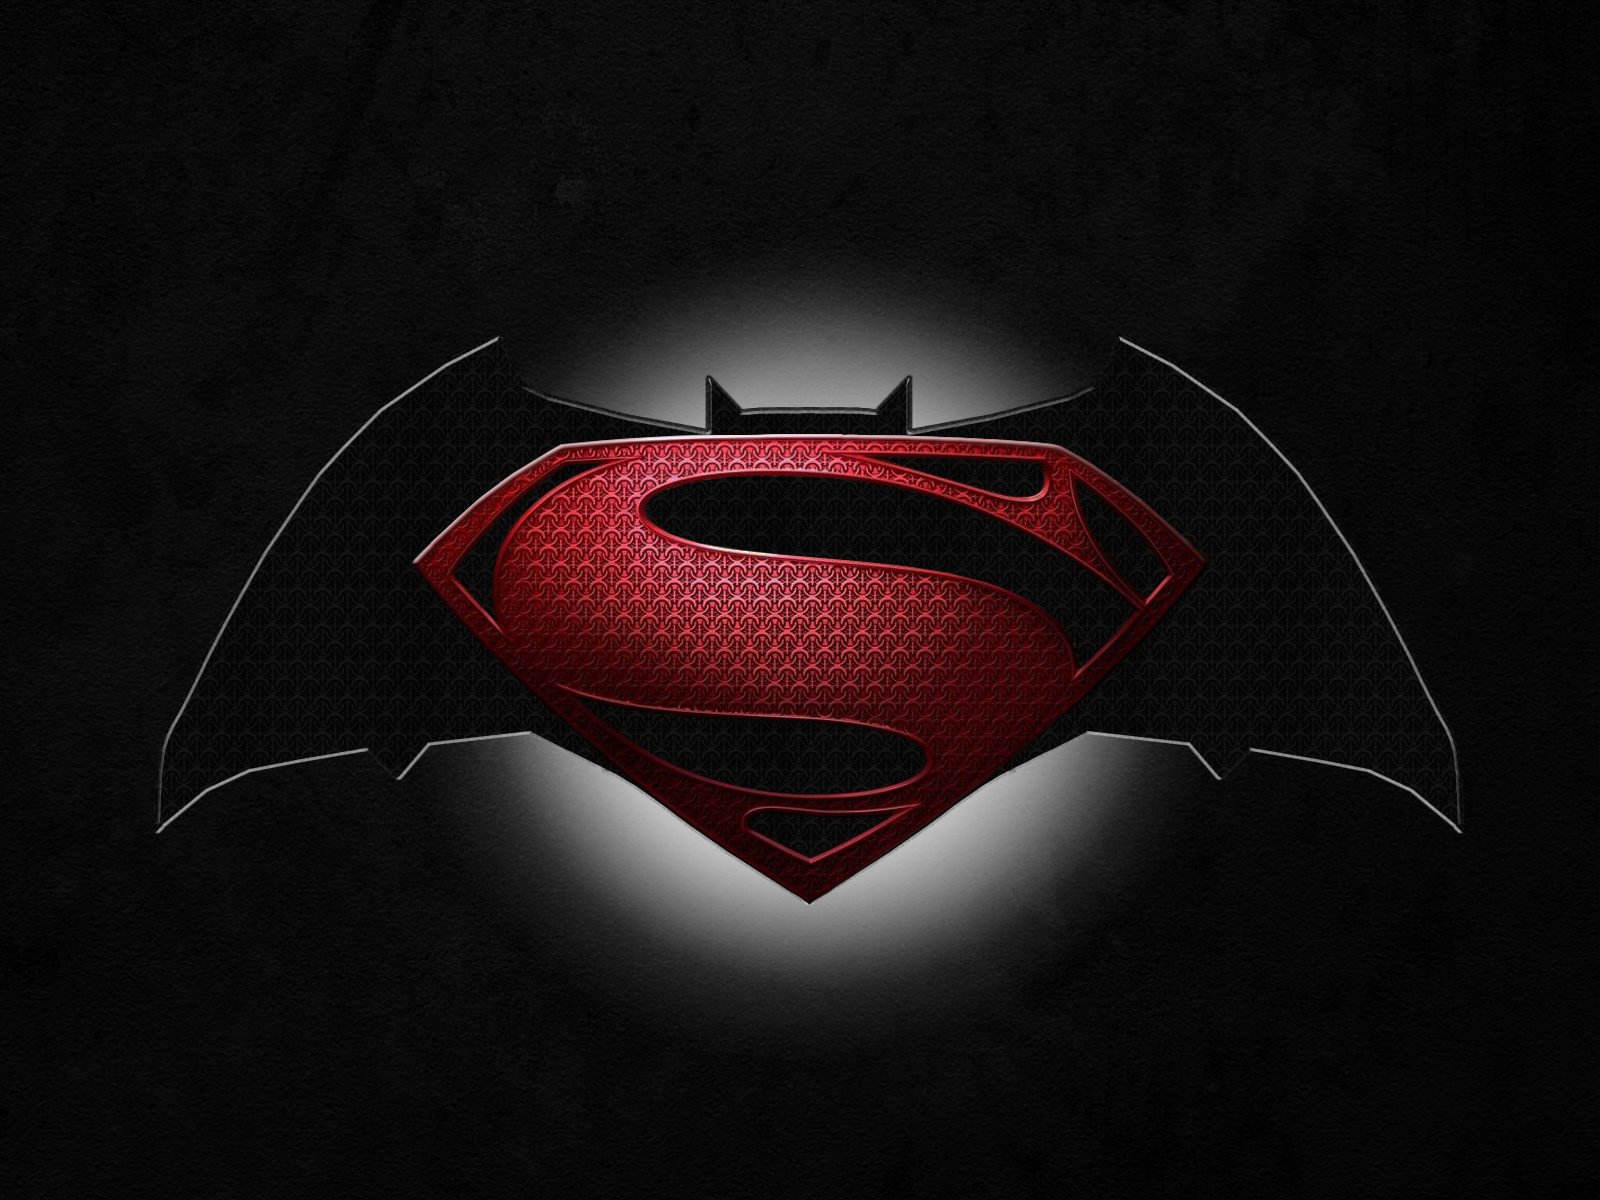 Batman VS Superman by bijit69 1600x1200